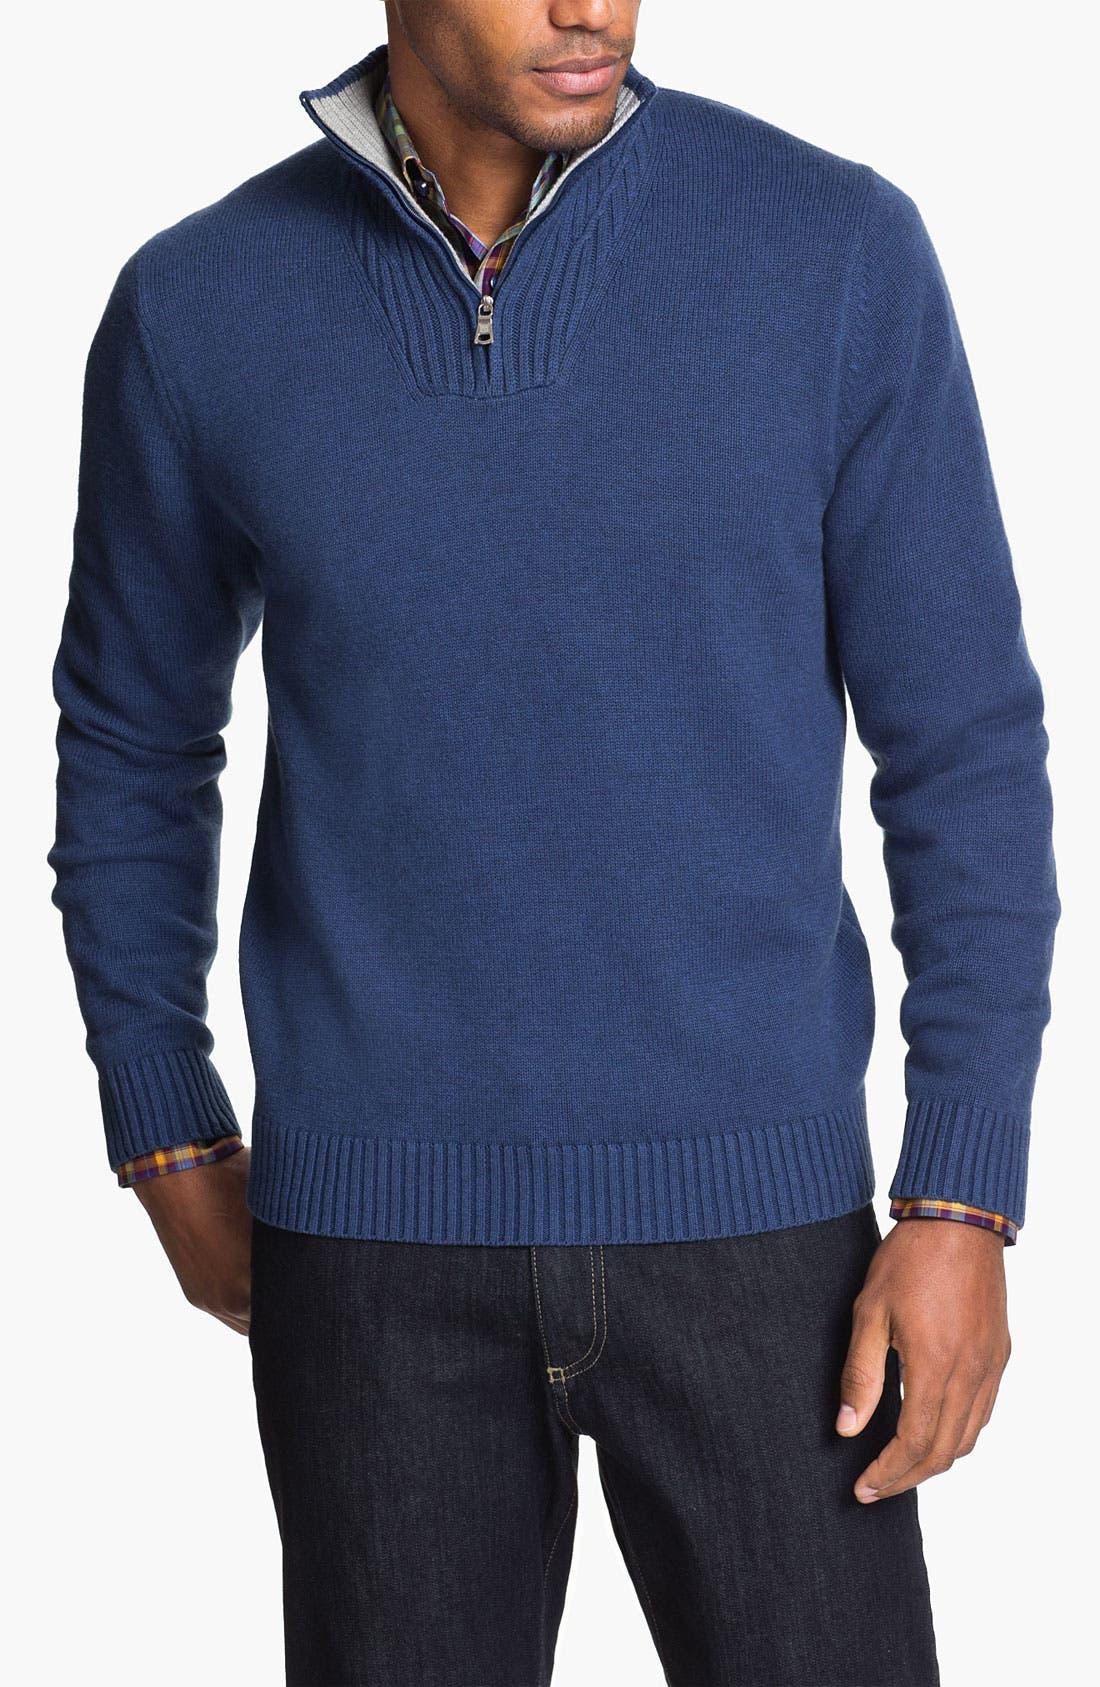 Main Image - Robert Talbott Half Zip Cotton & Cashmere Sweater